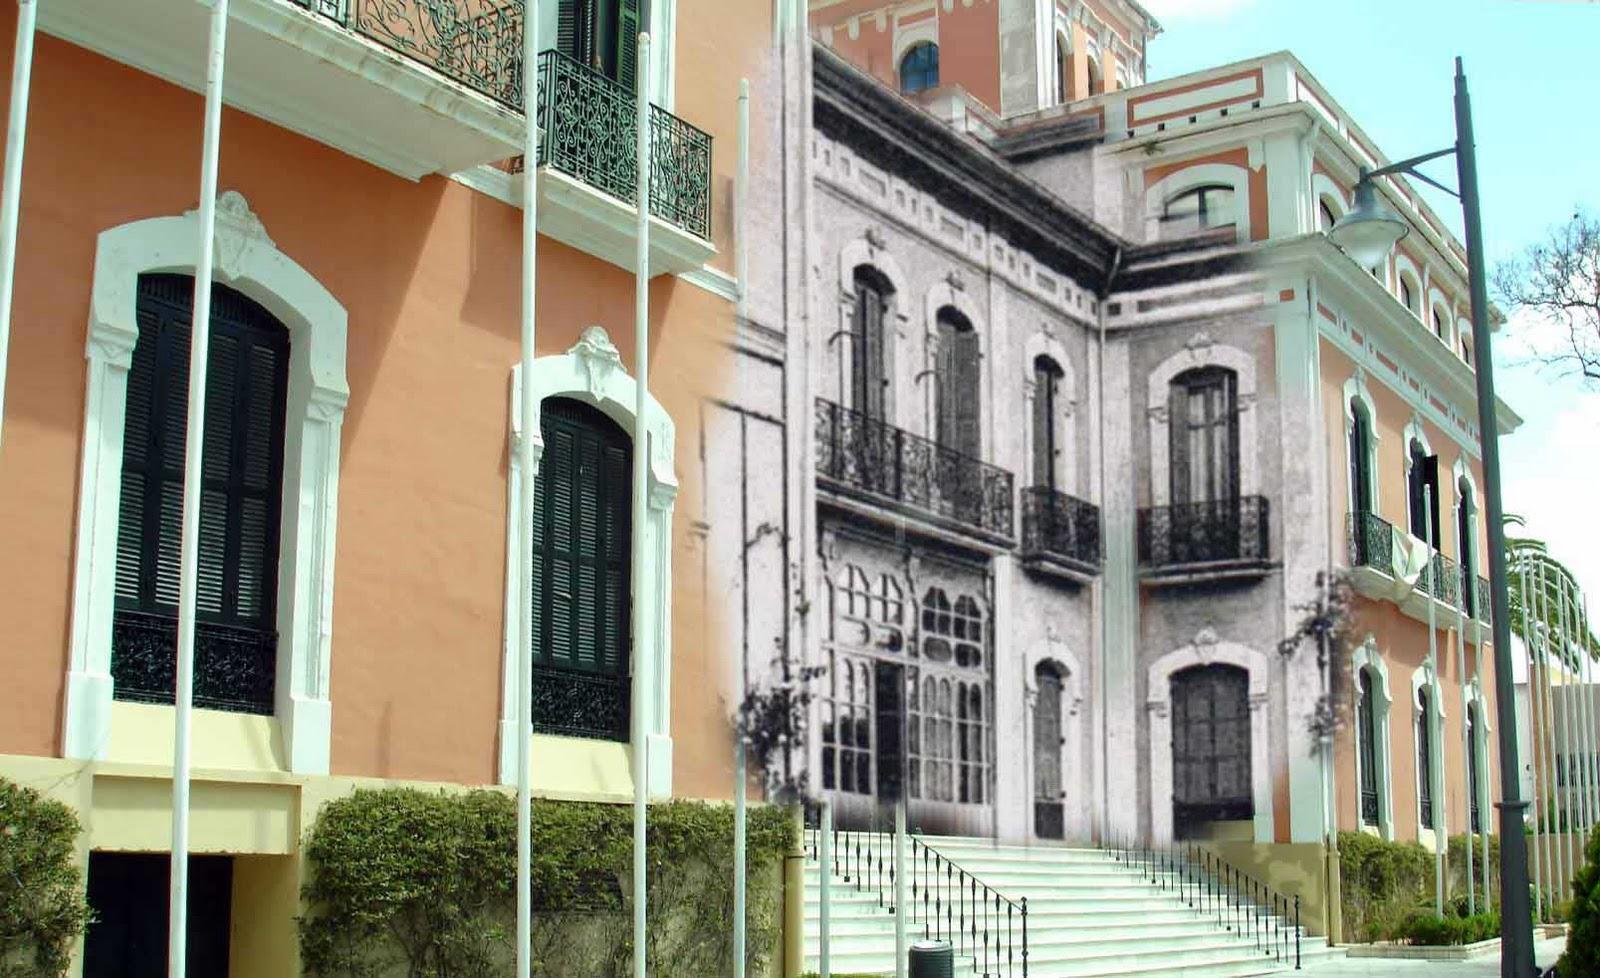 Huelva antigua la casa col n hotel col n - Casa colon huelva ...